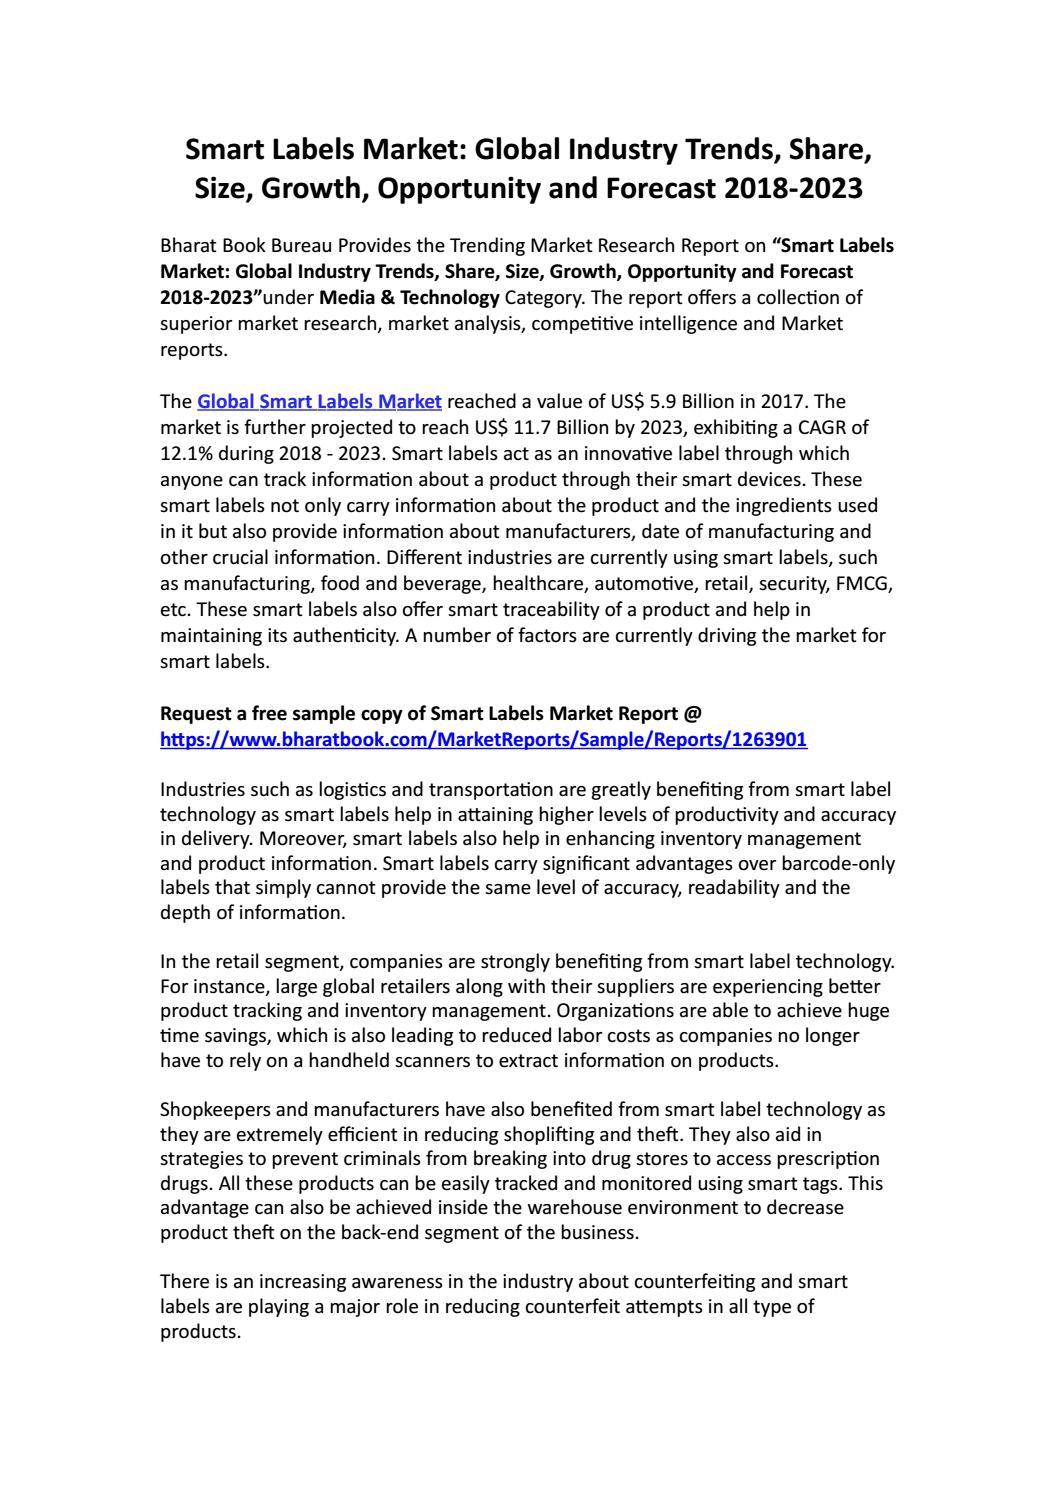 Smart Labels Market: Global Industry Trends, Share, Size